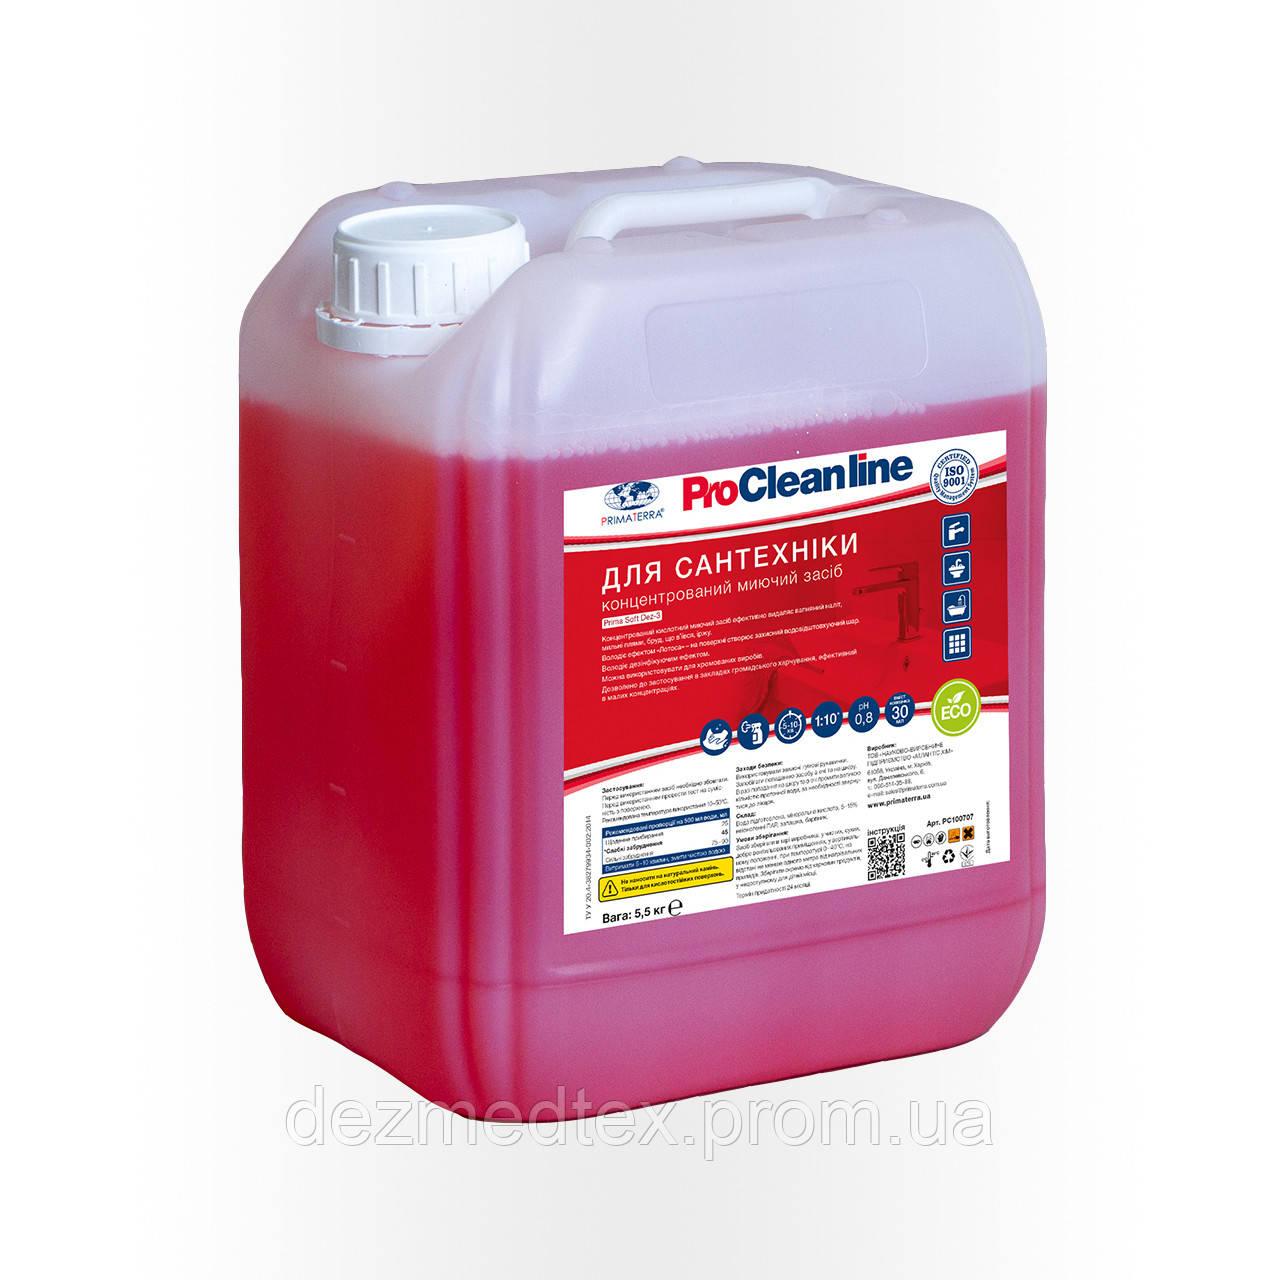 Для сантехники по стандартам HACCP Dez-3 (5,5кг)